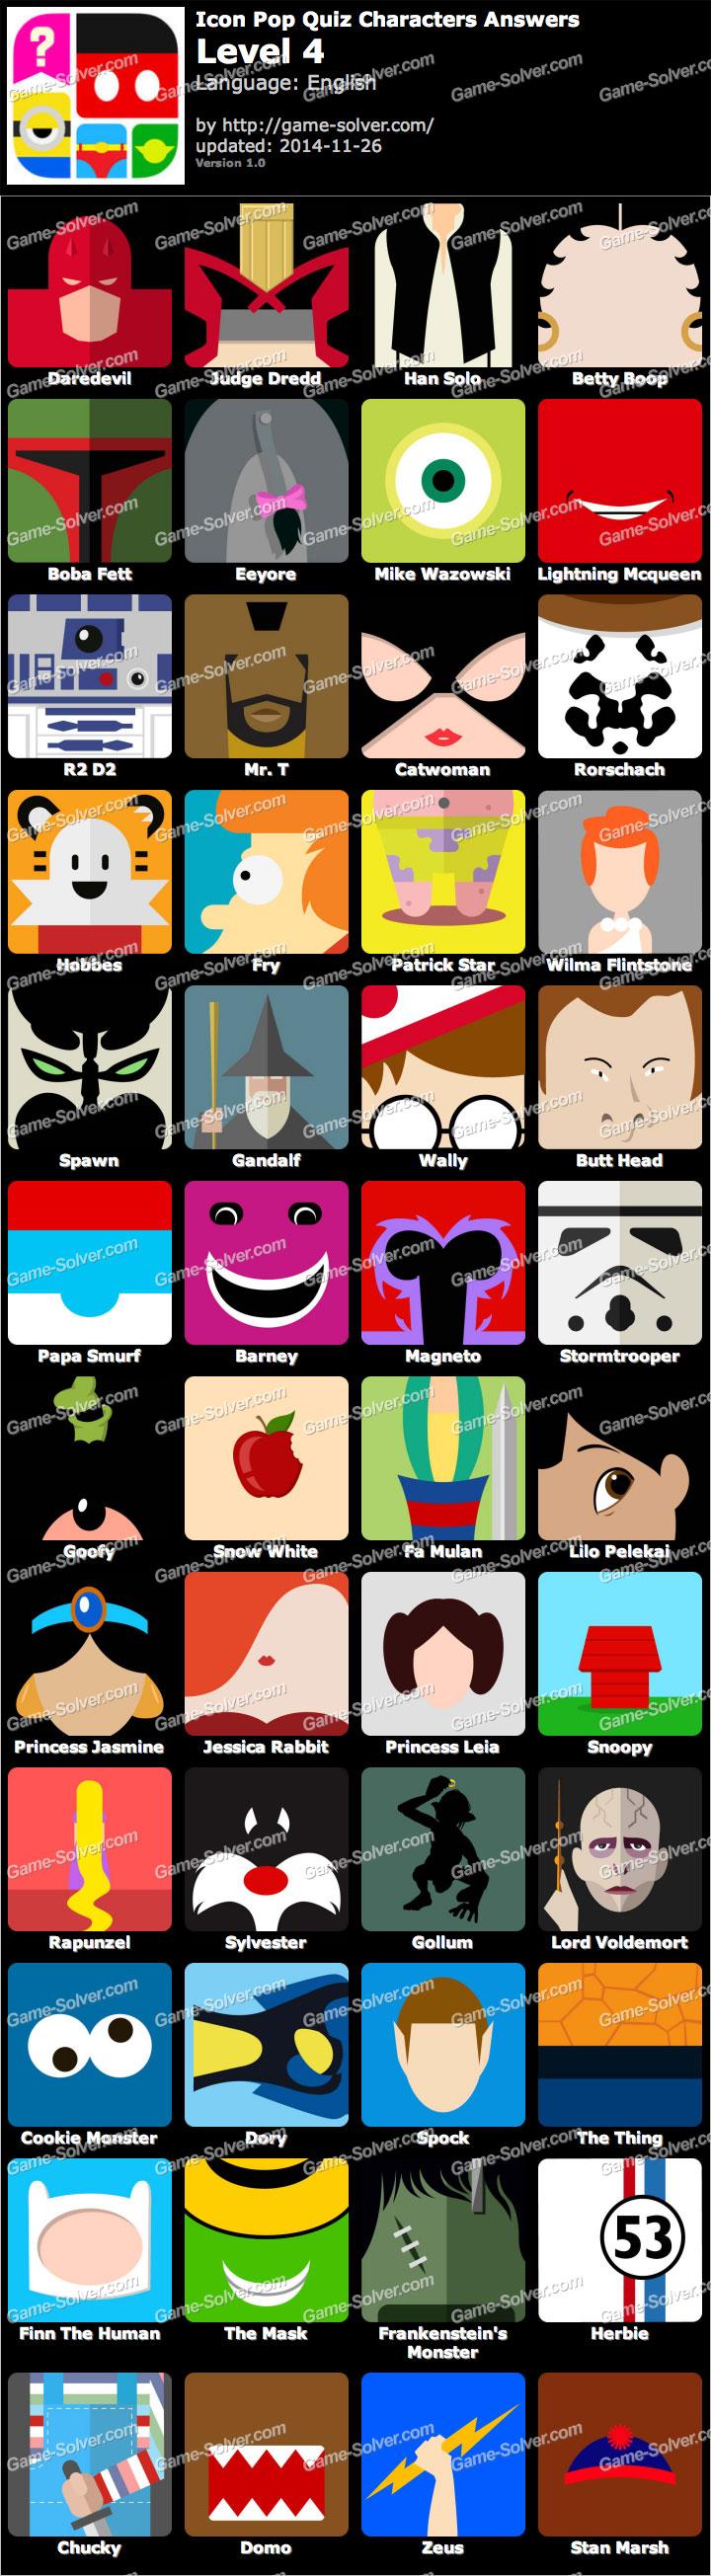 Icon Pop Quiz Characters Level 4.